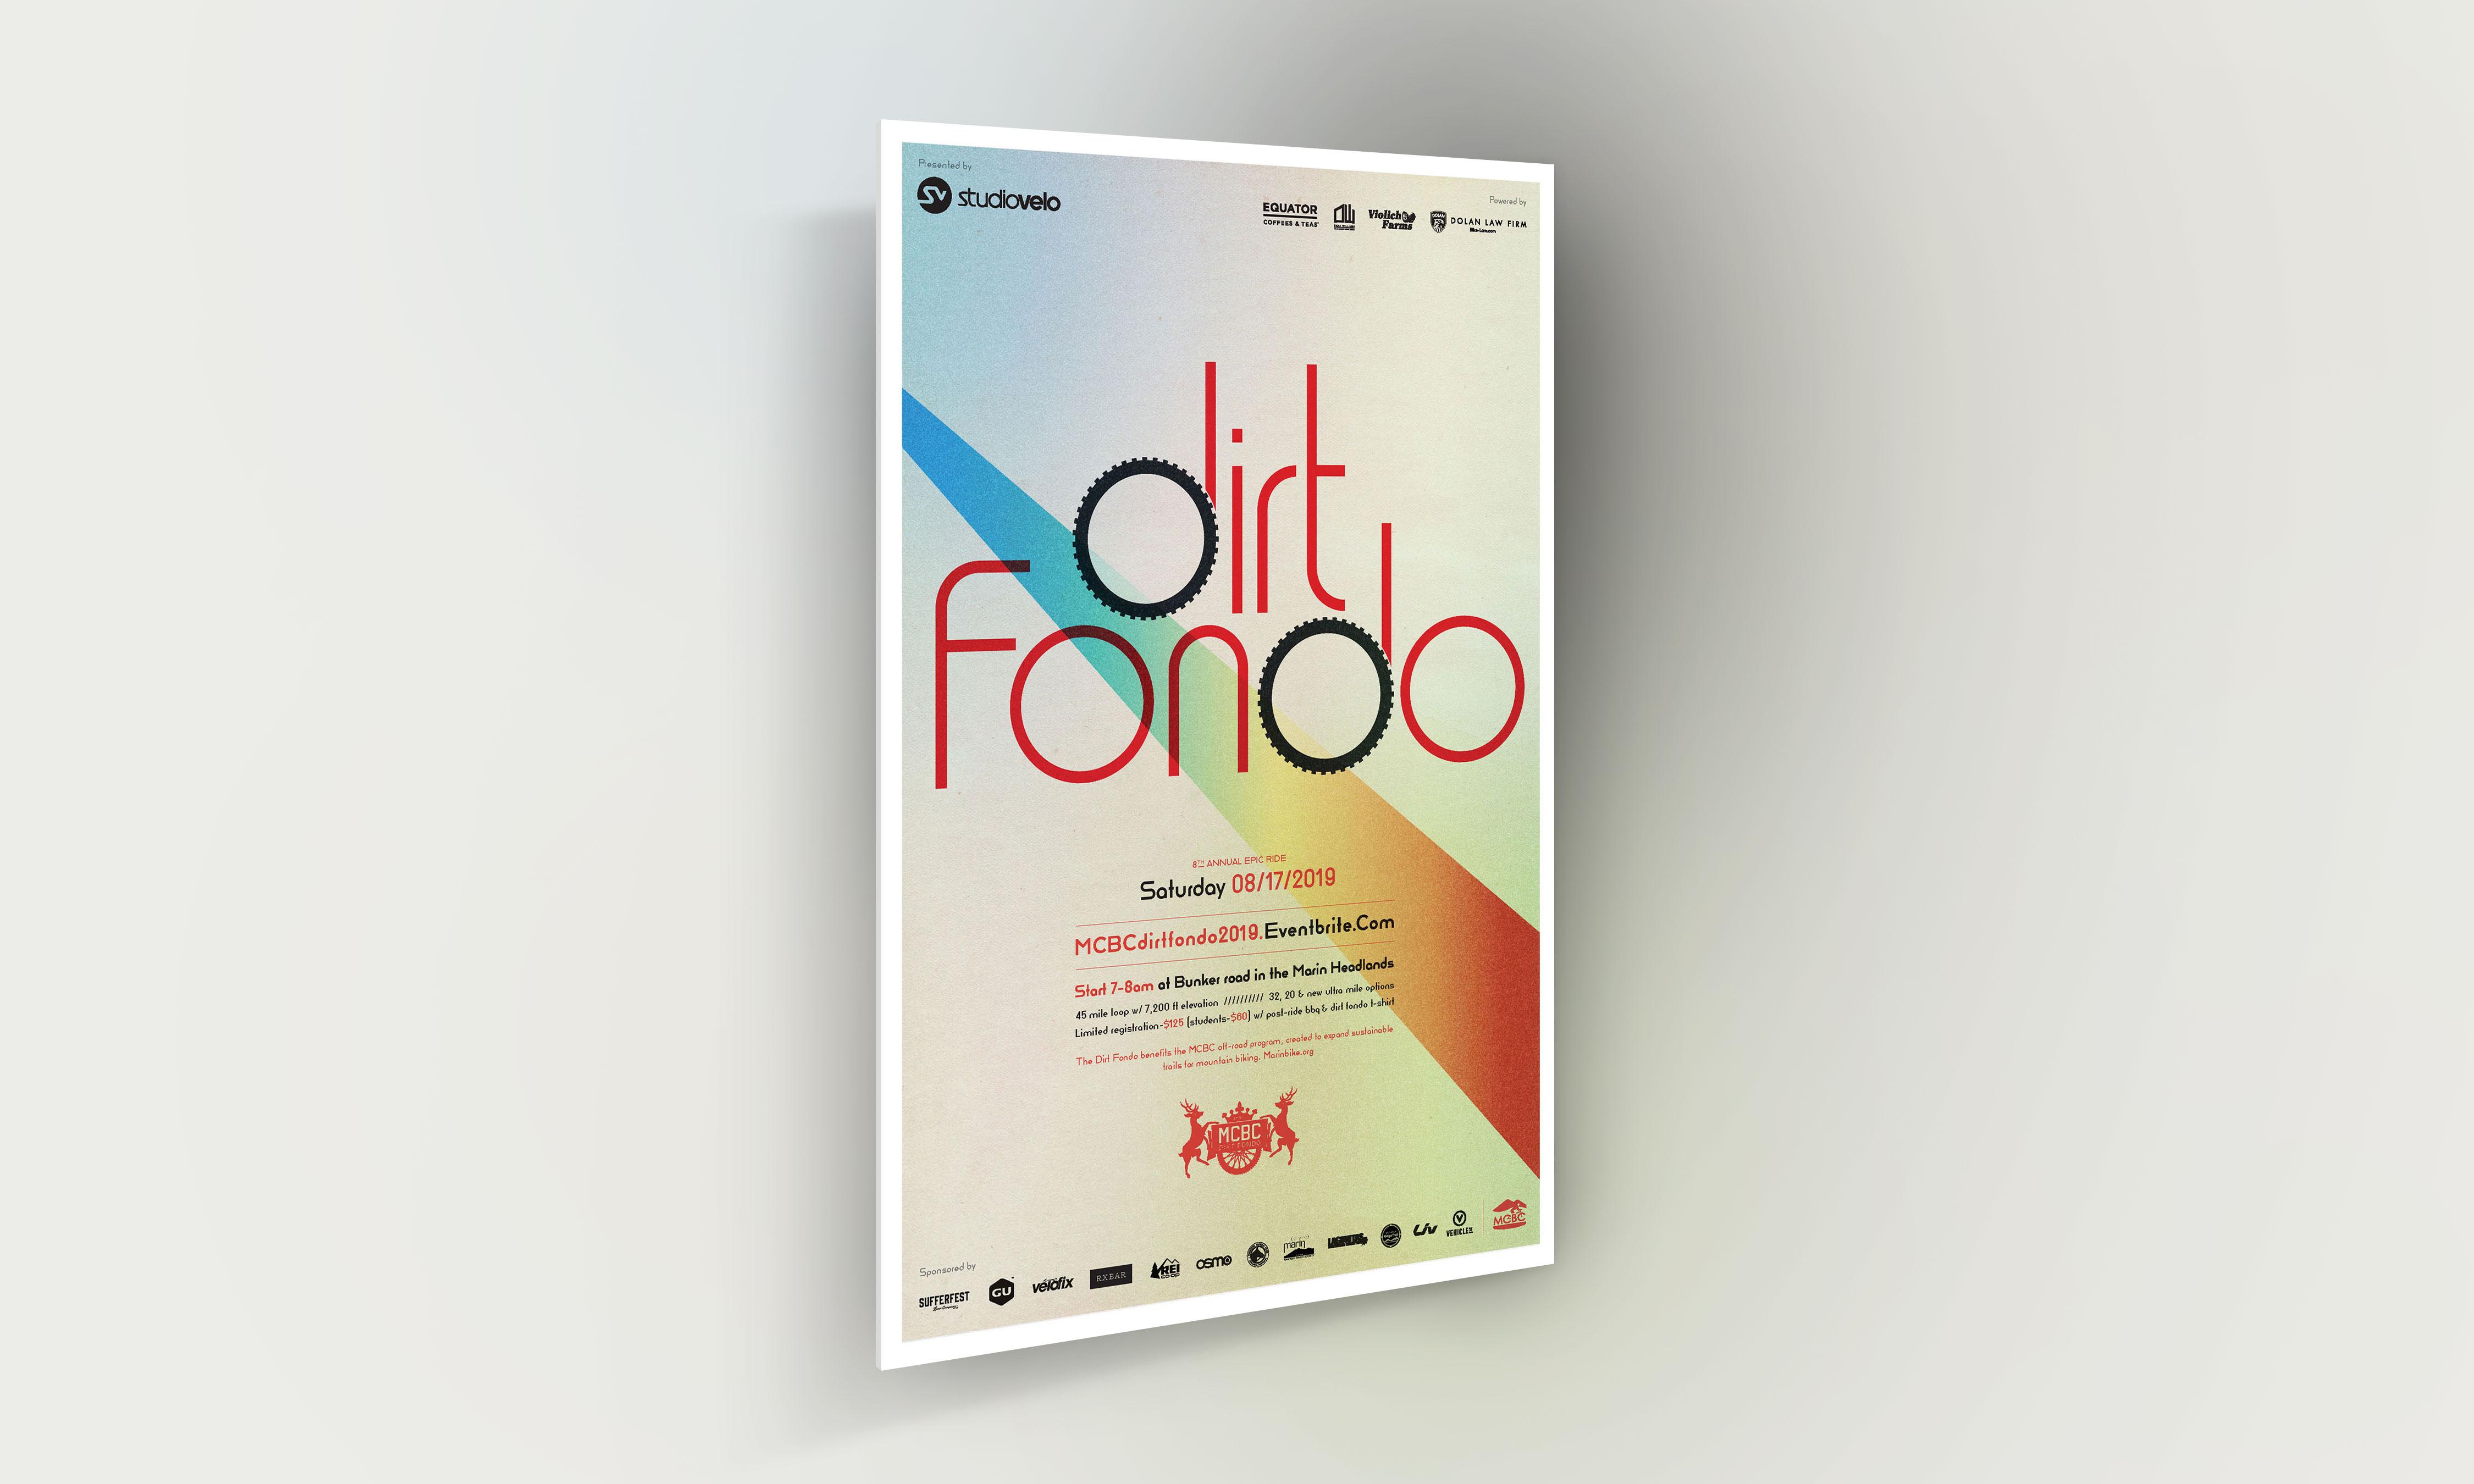 Dirt Fondo poster with dirt fondo logo and grainy gradient background design digital render